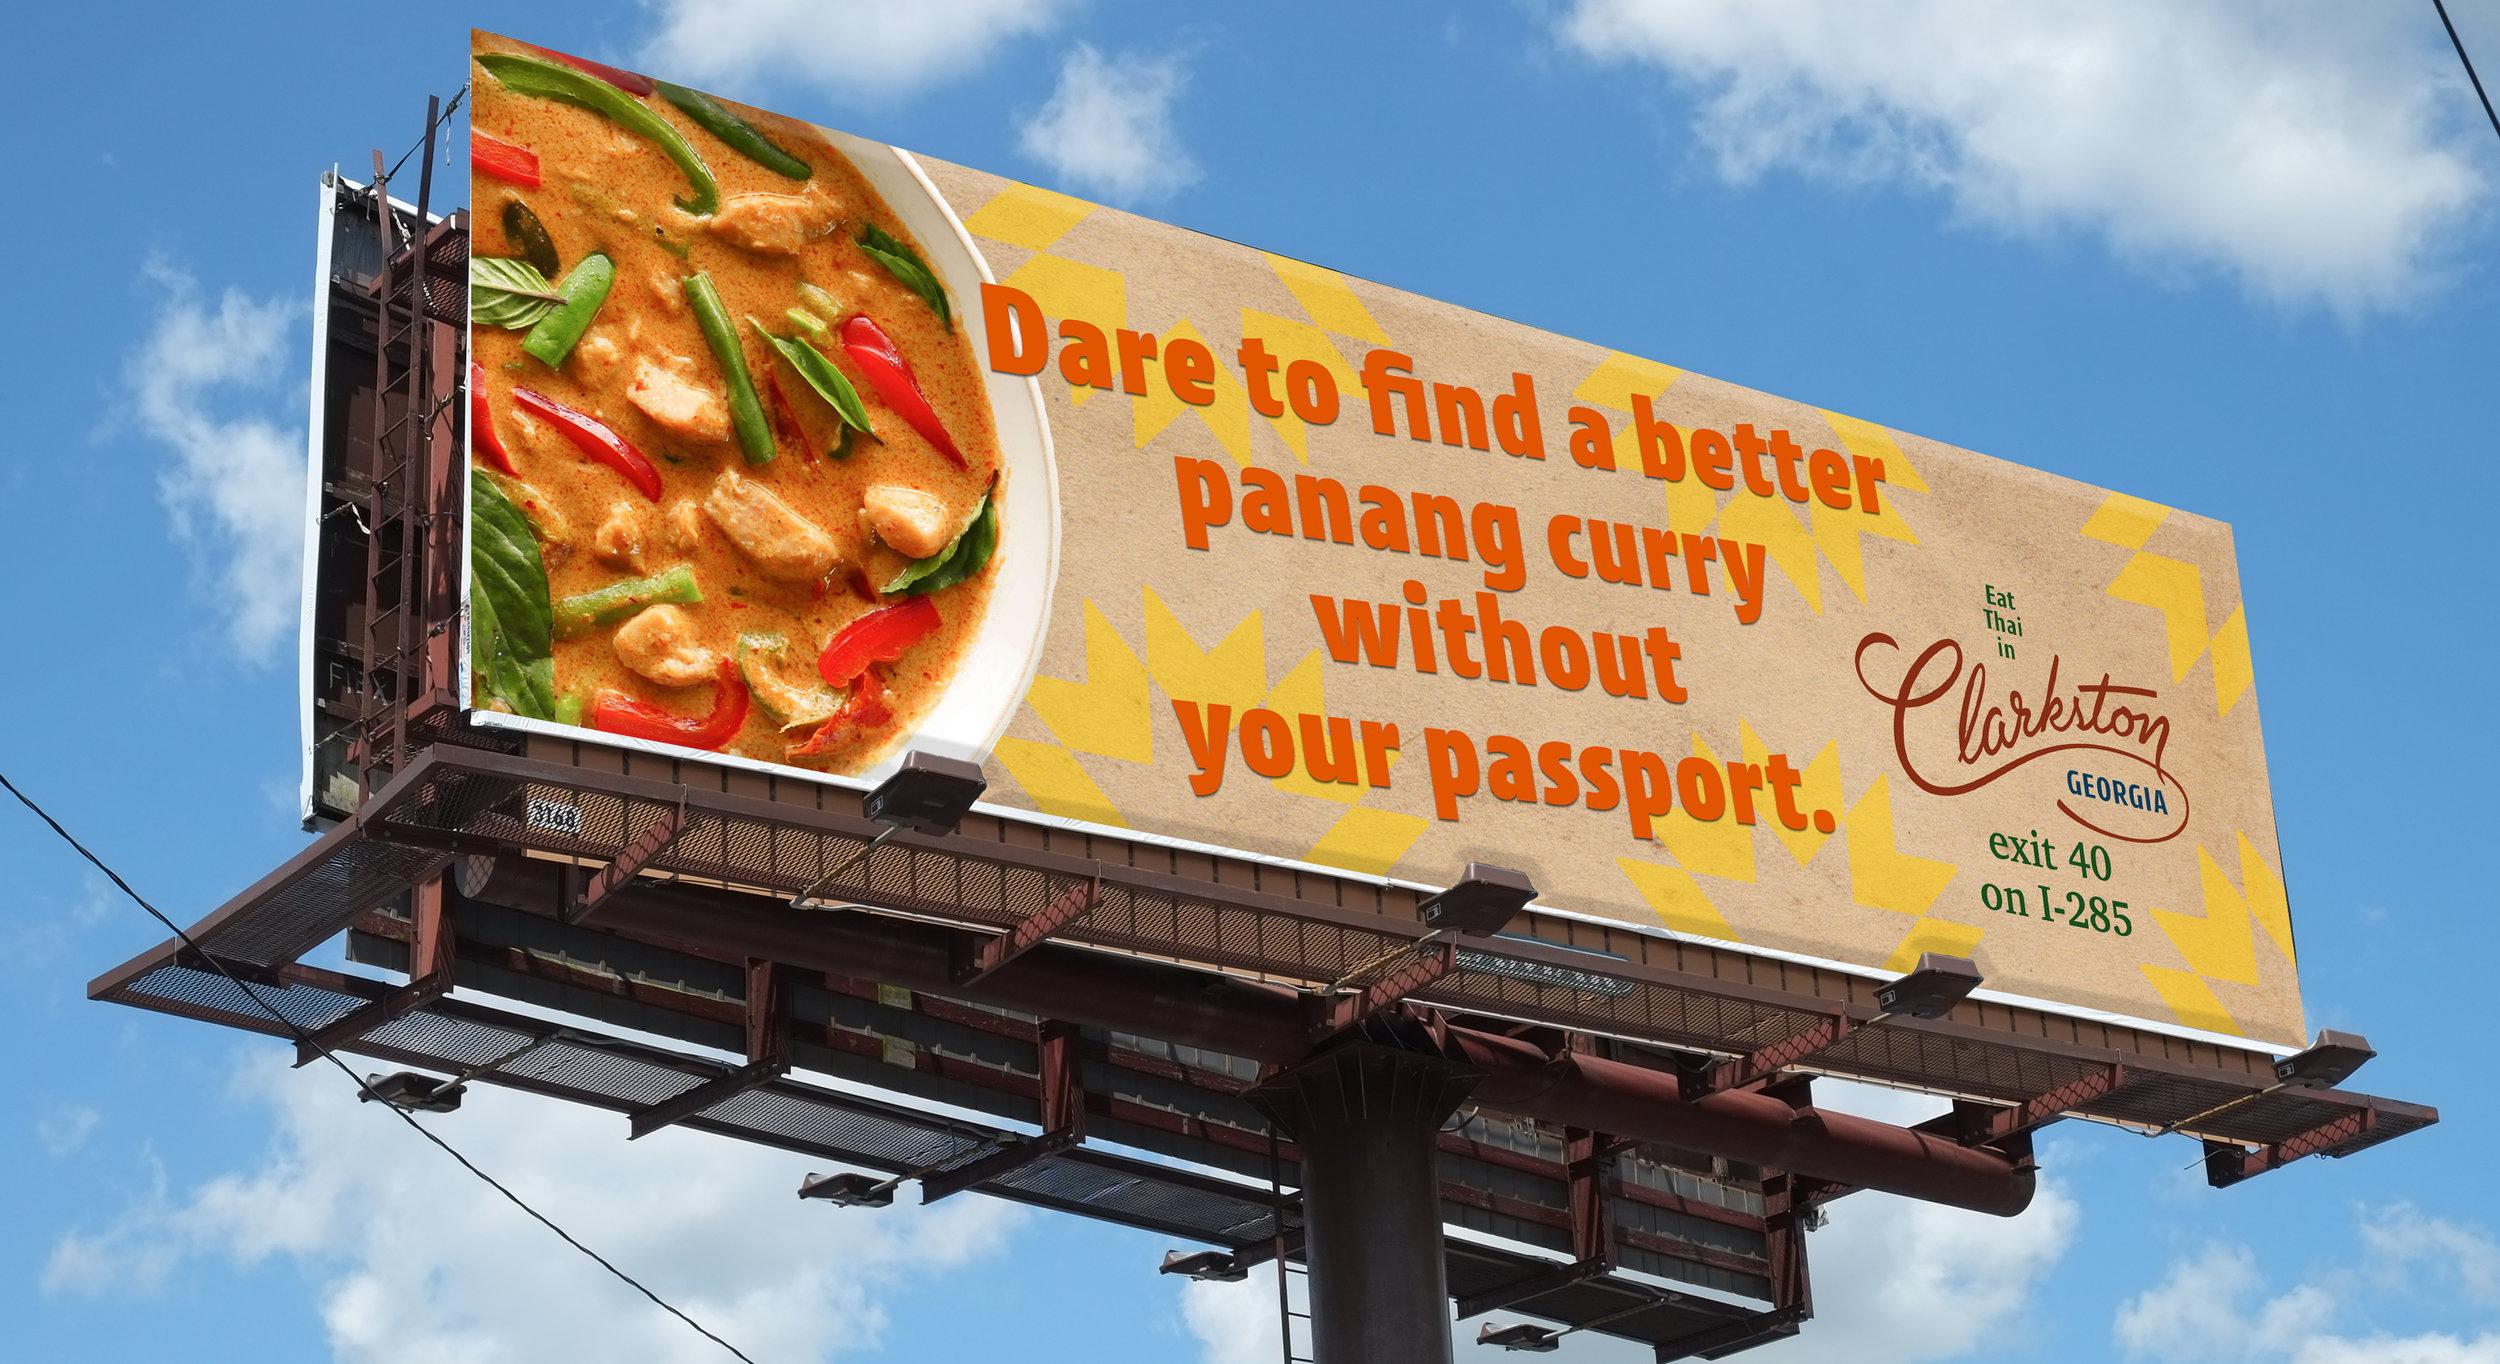 billboard mockup 3 (3).jpg